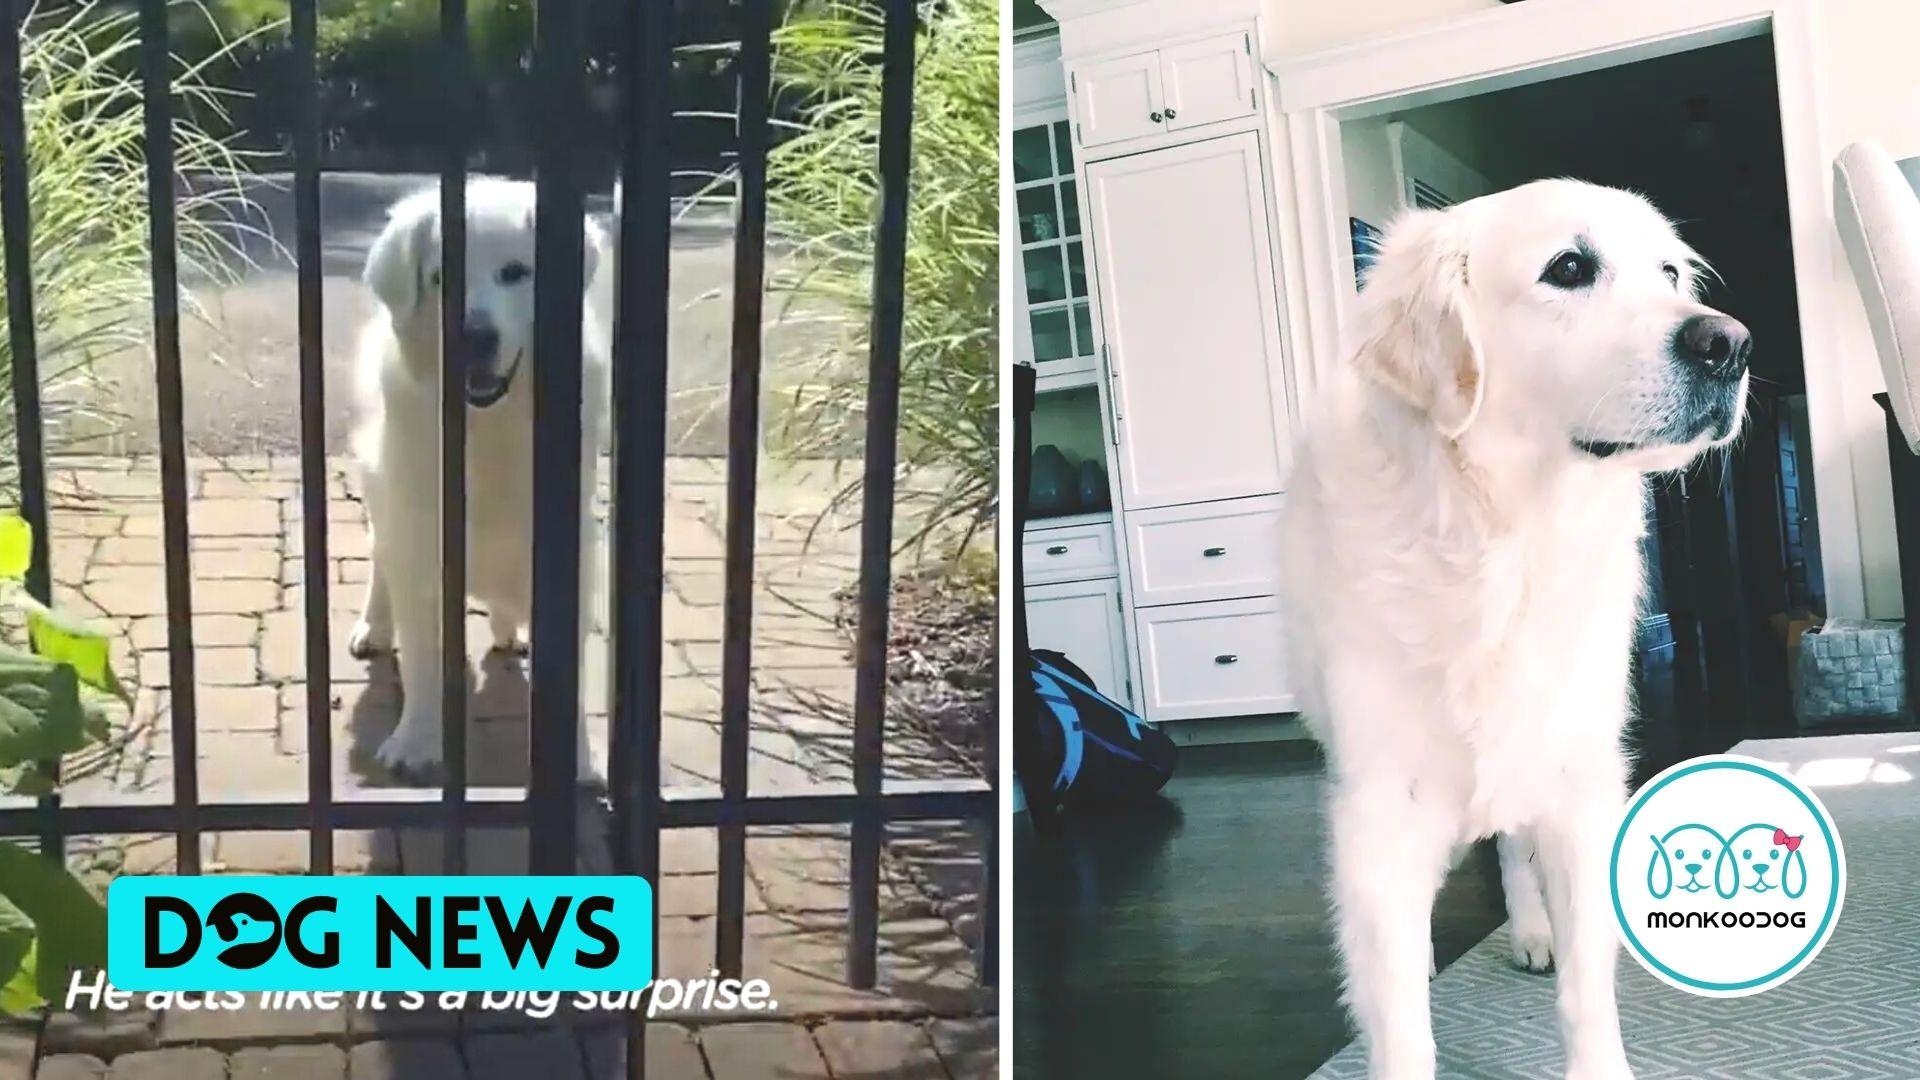 14-Year-Old Golden Retriever Brings Surprises